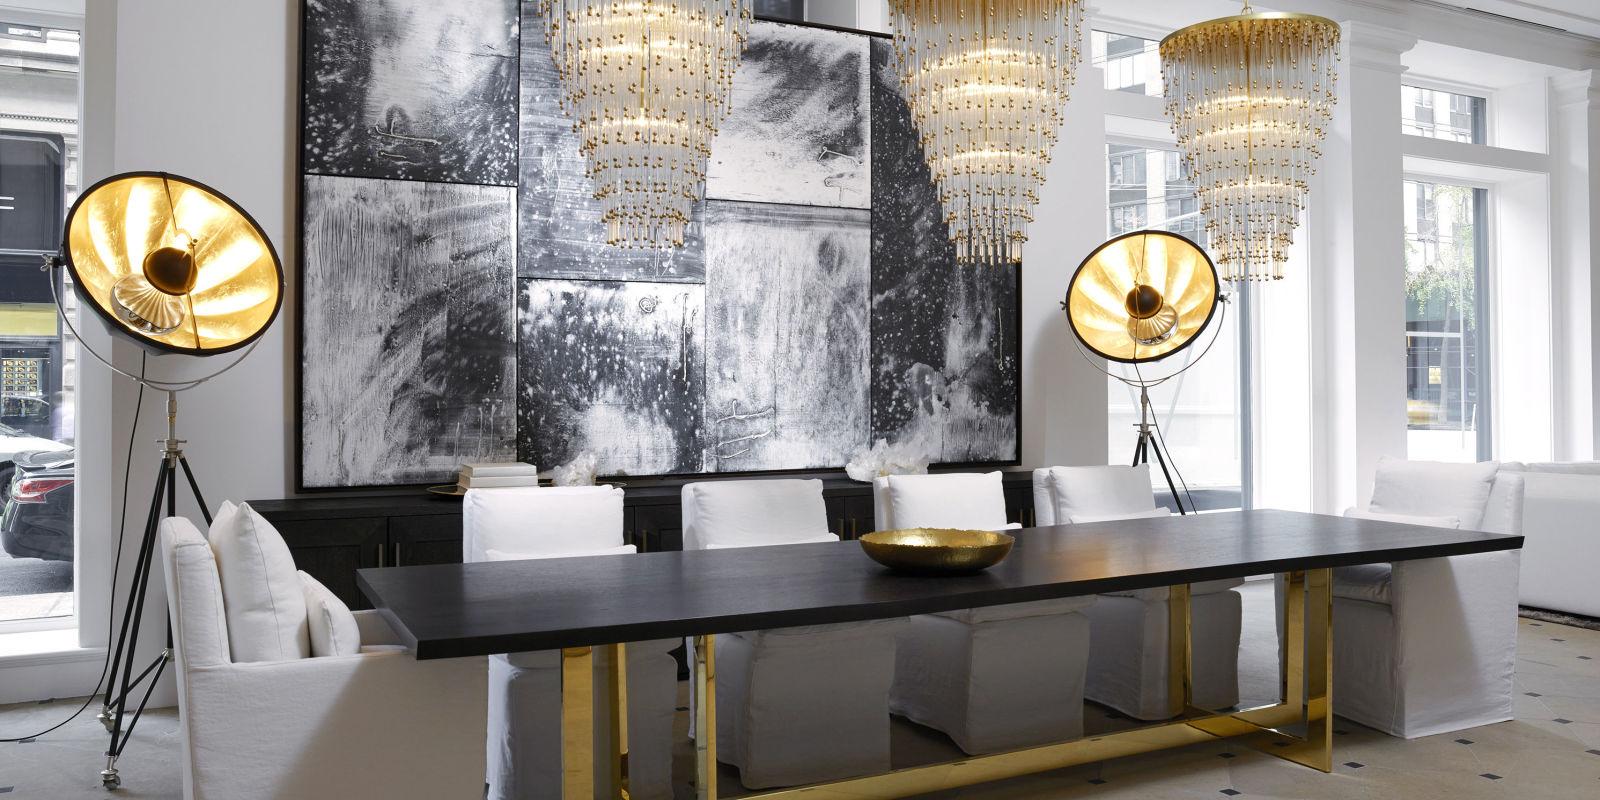 restoration hardware introduces new multi channel business. Black Bedroom Furniture Sets. Home Design Ideas